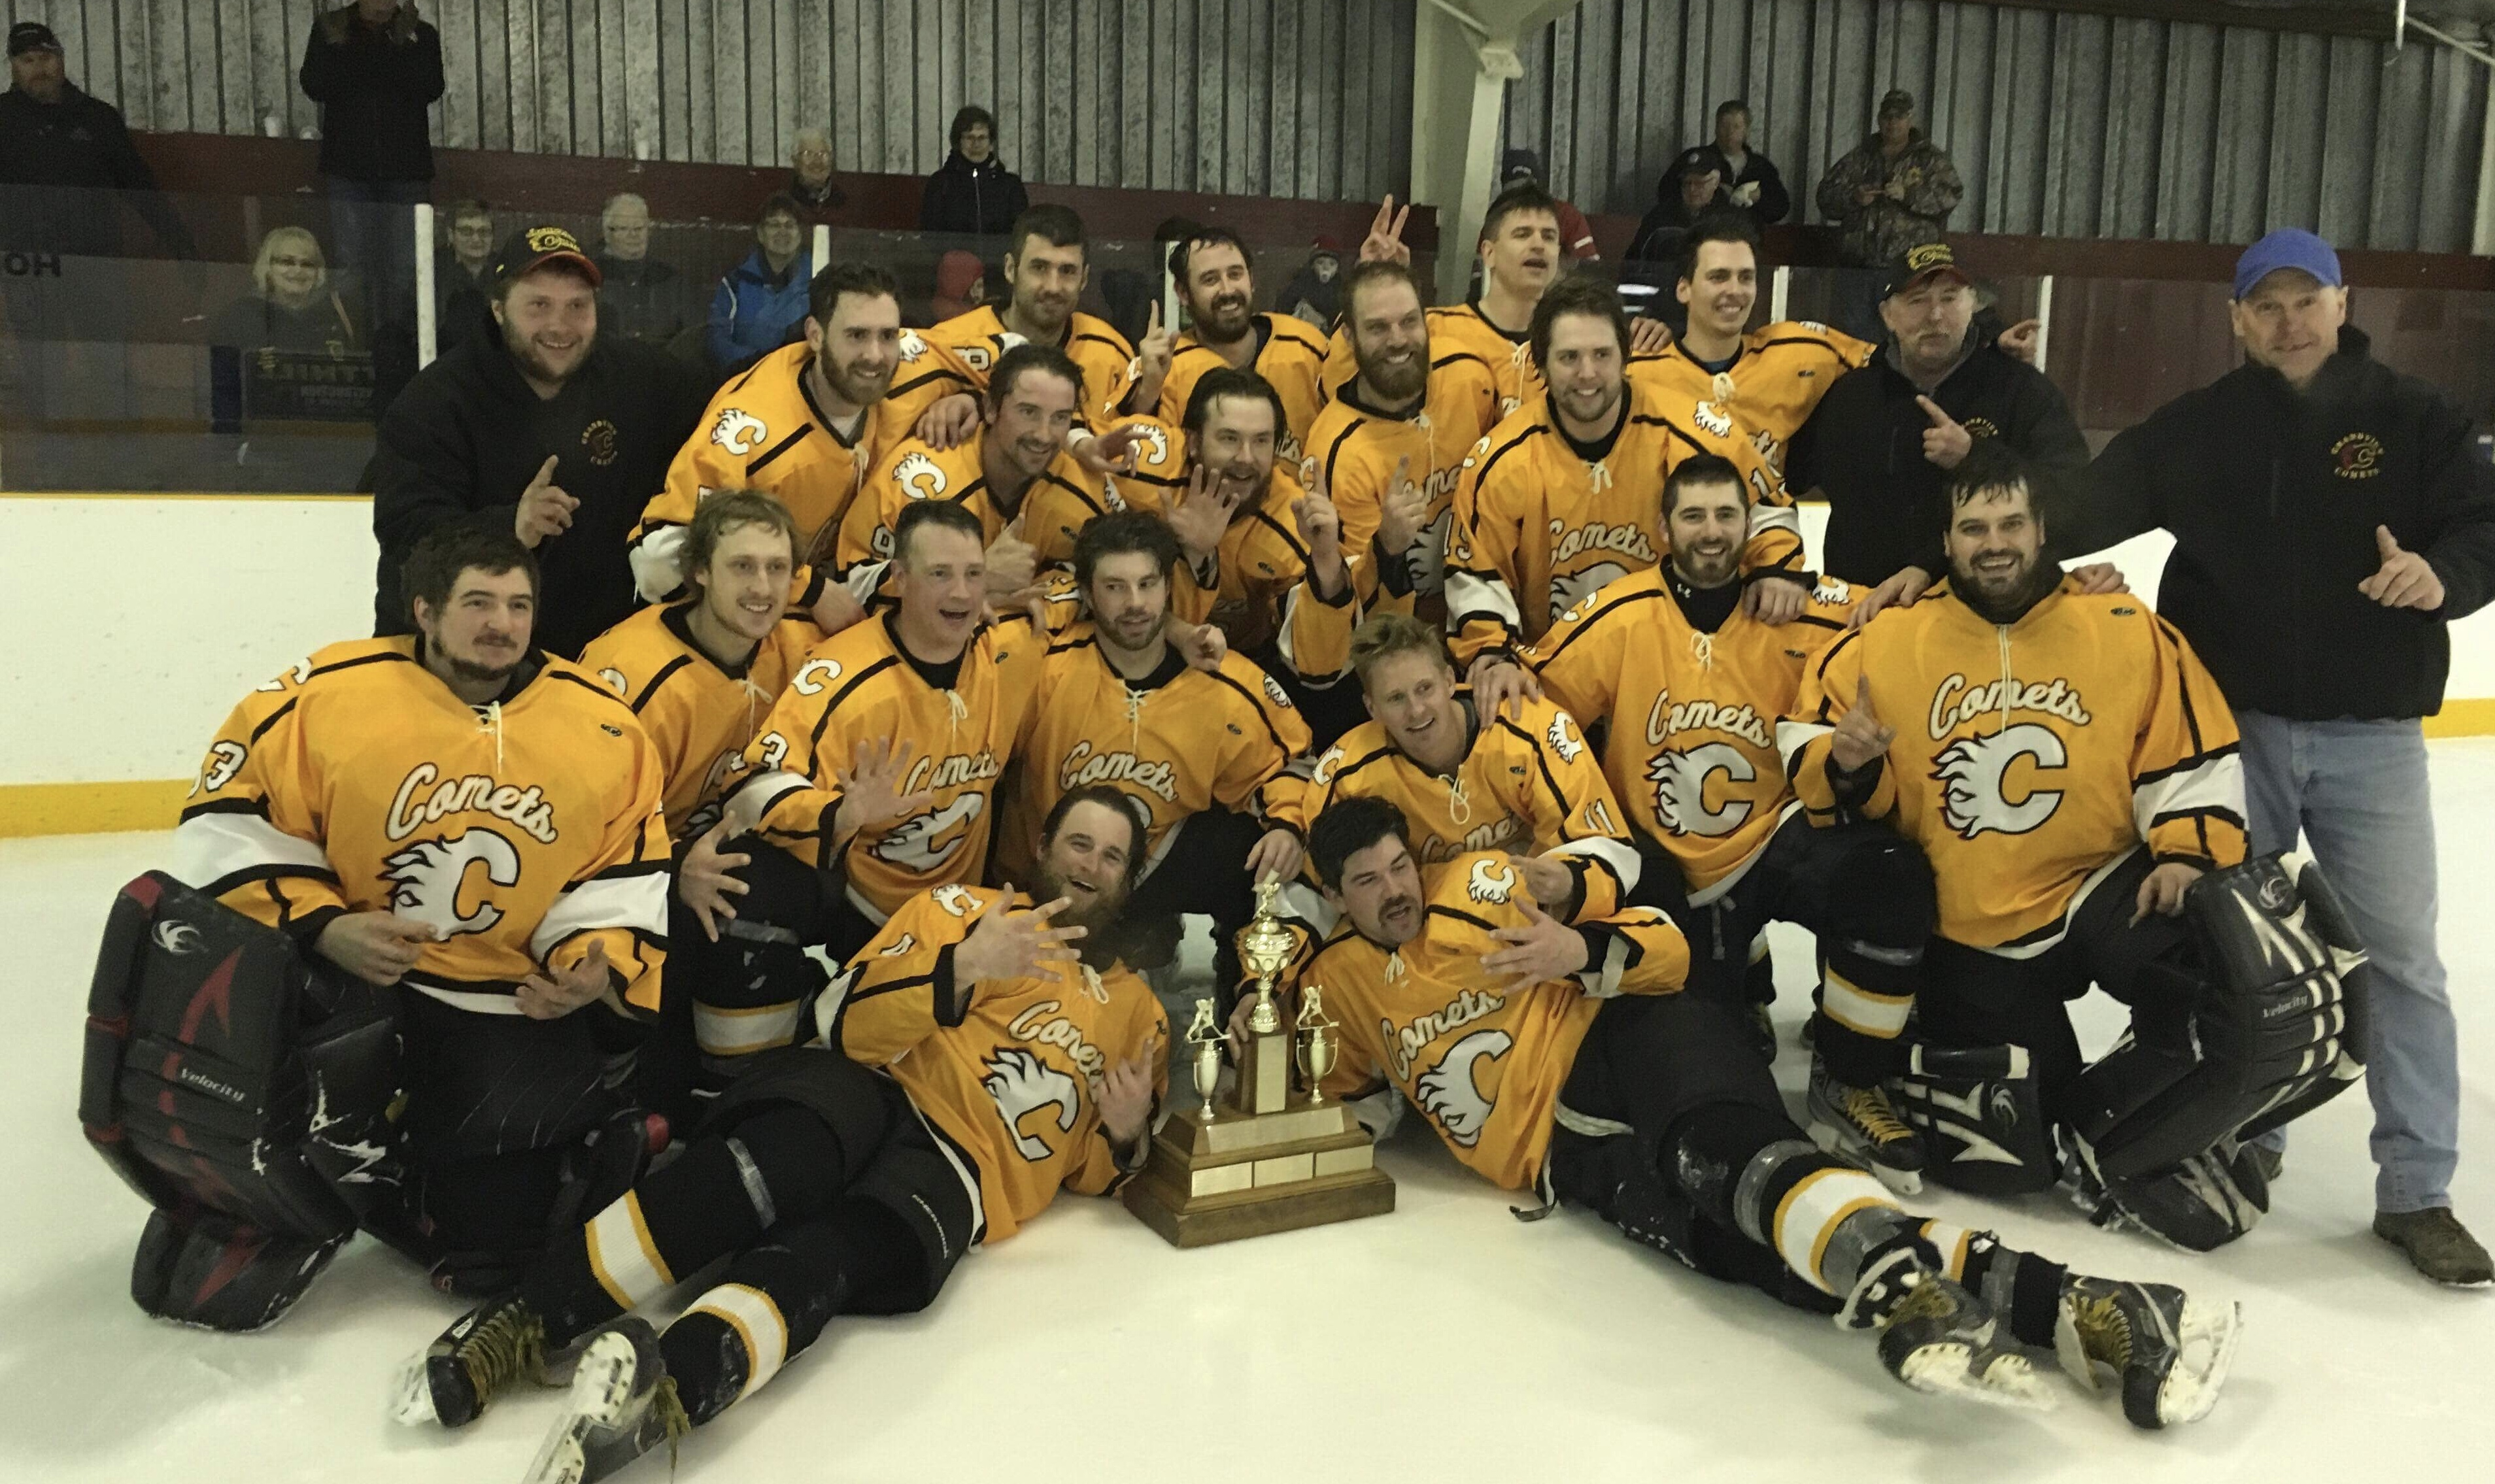 2017-18 North Central Hockey League season